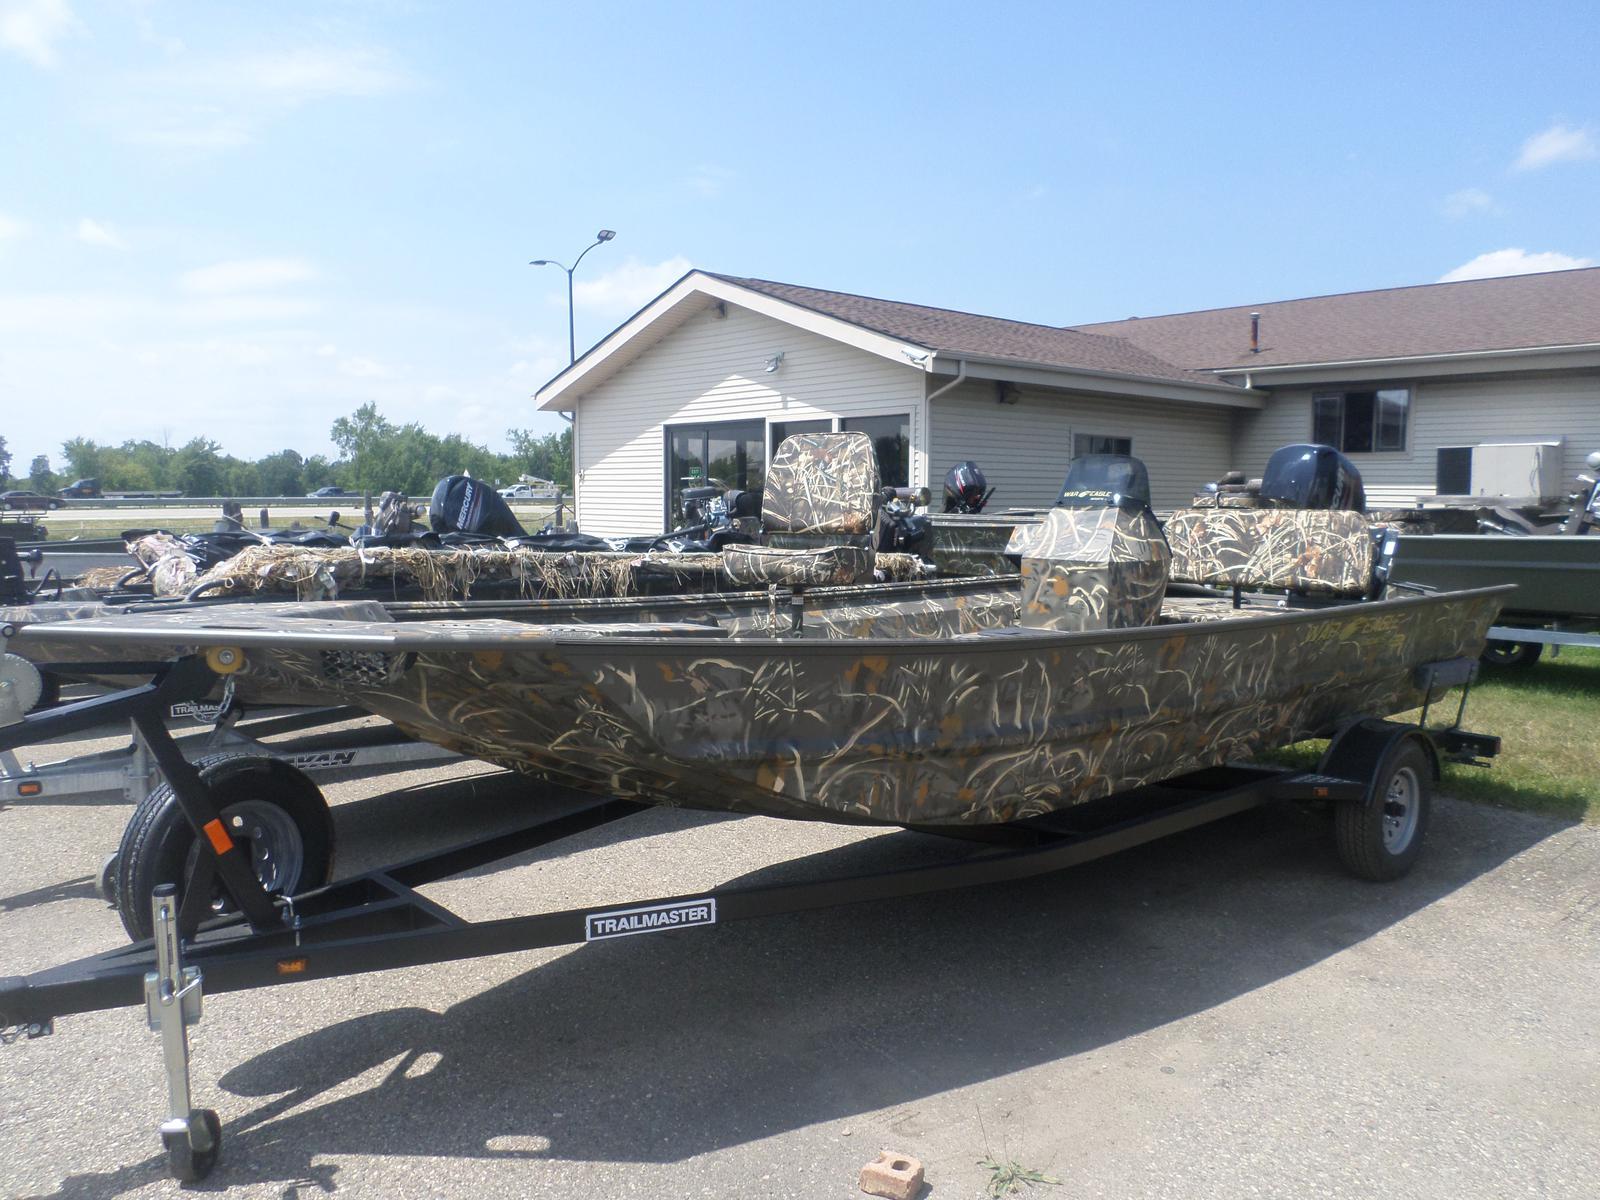 War Eagle 860LDBR